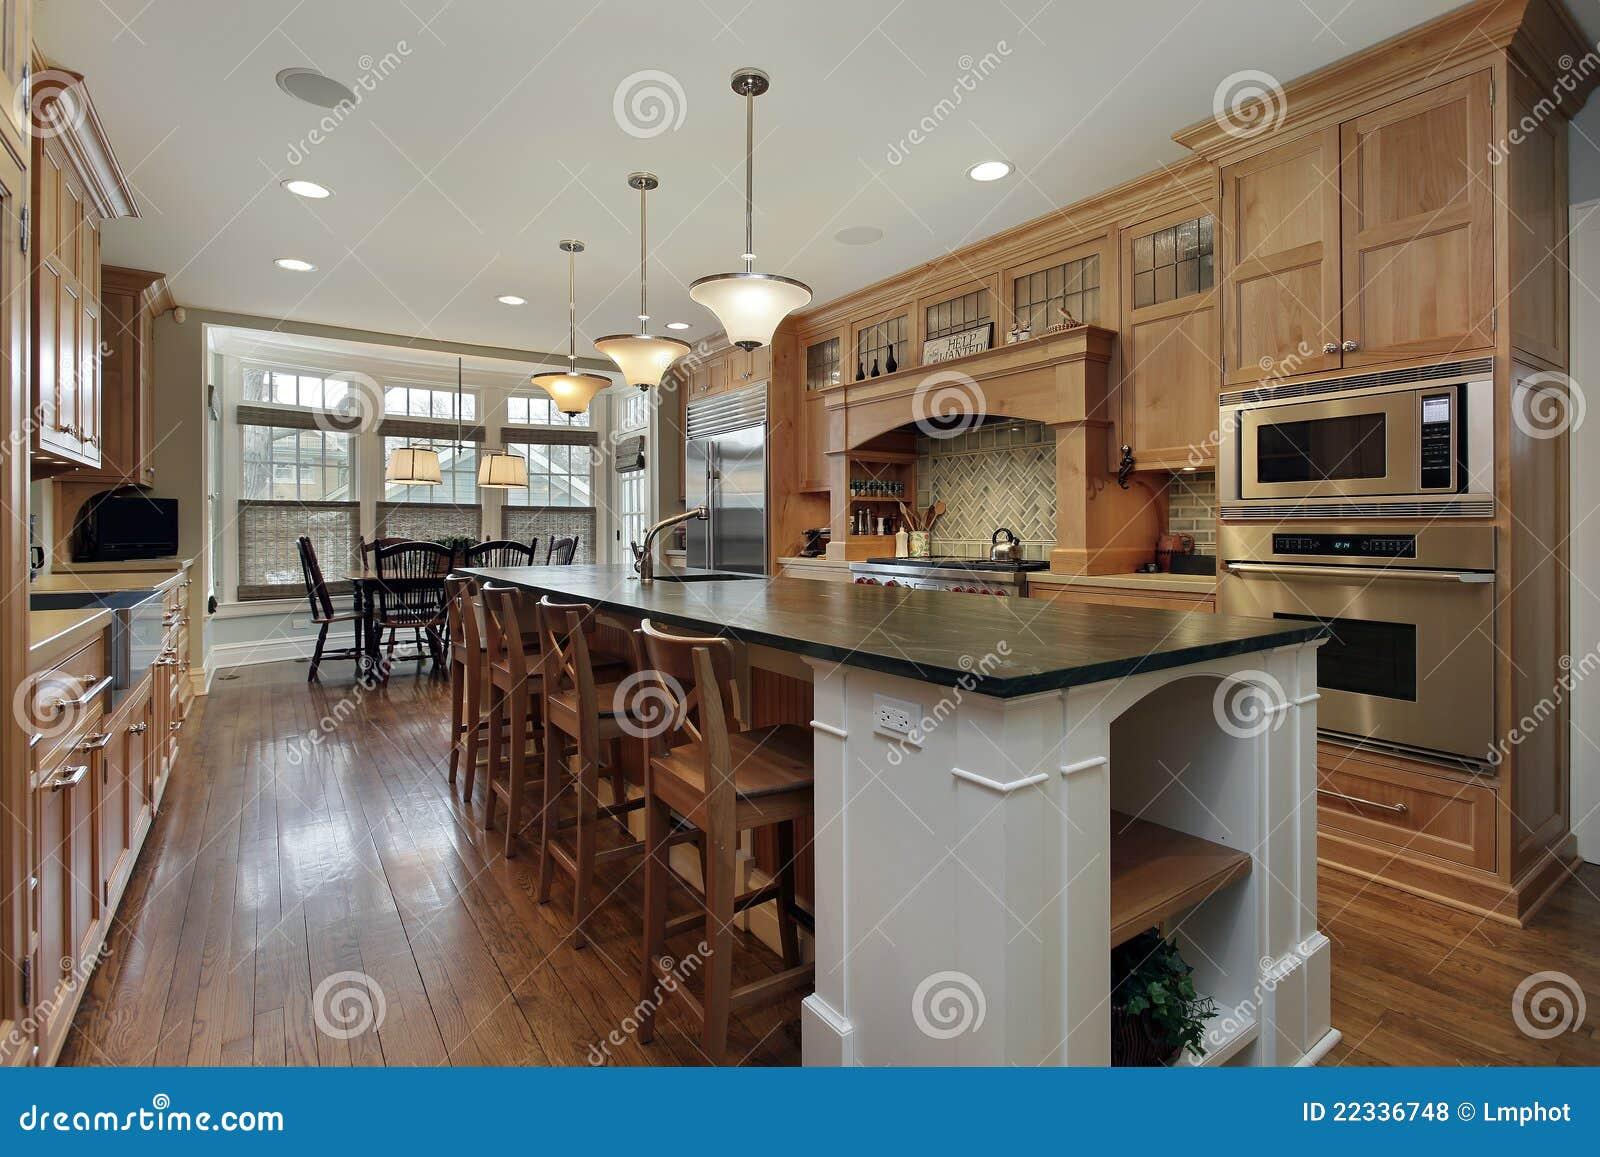 Stock keukens